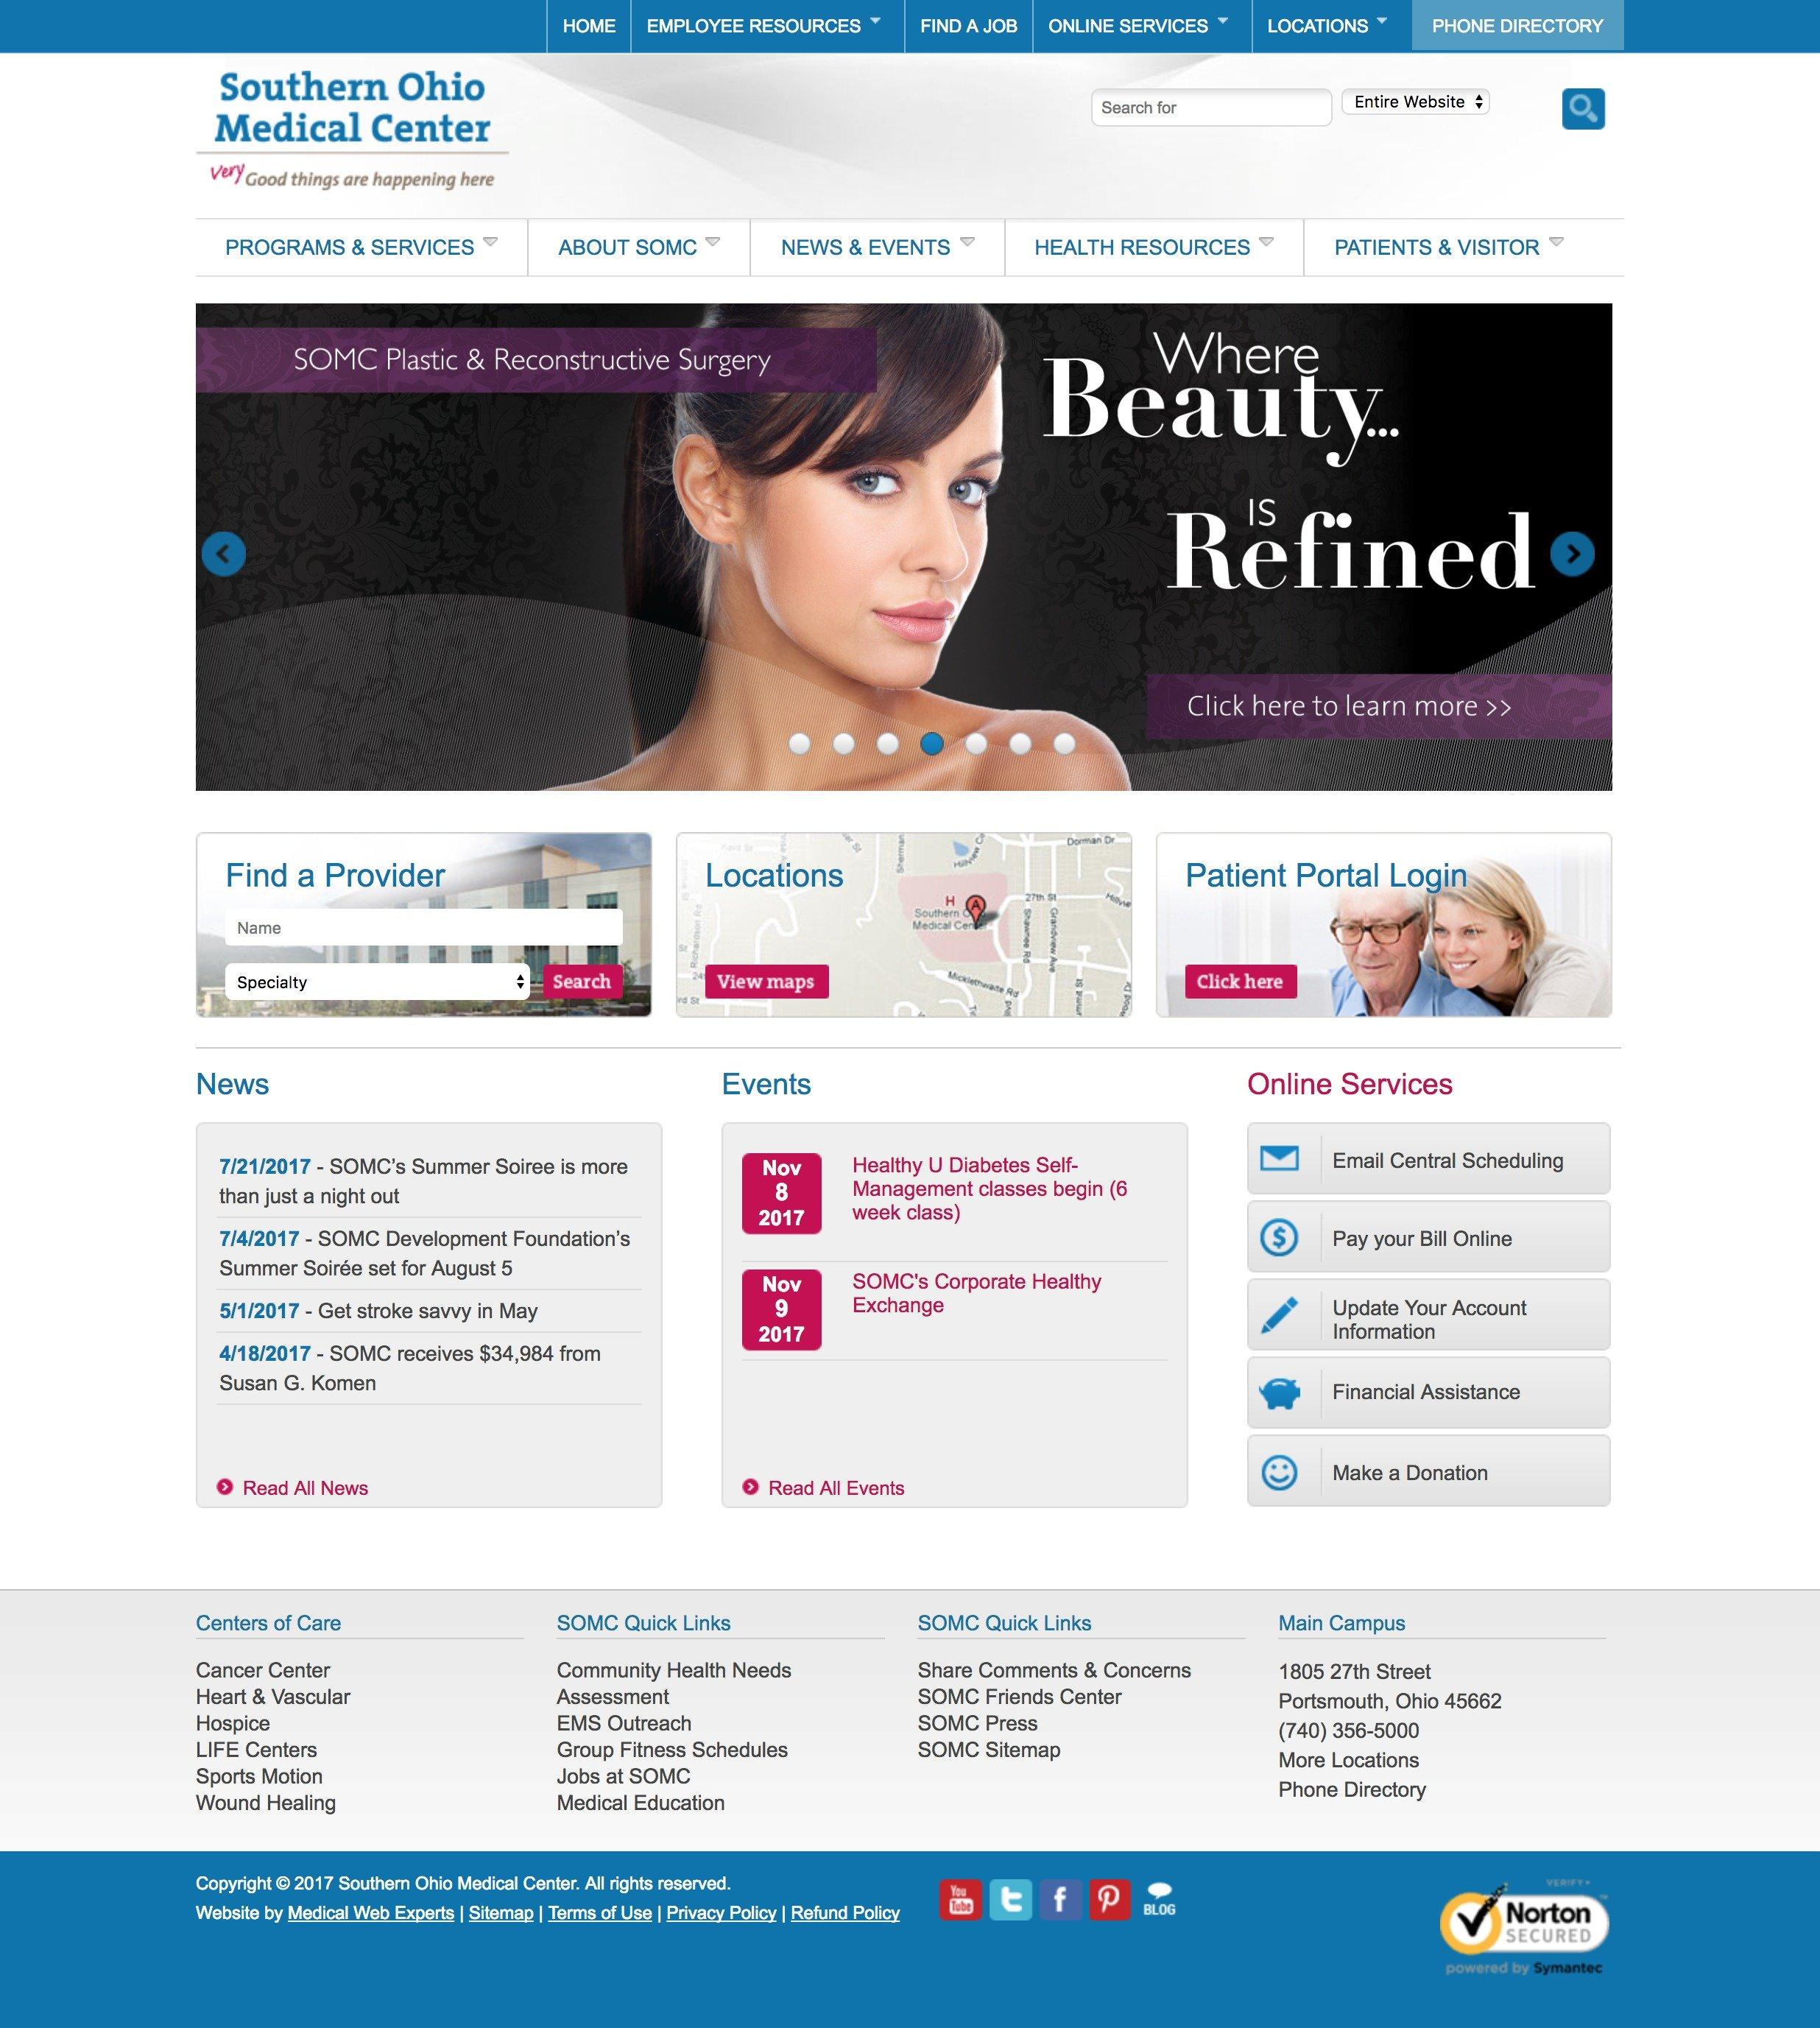 Medical Web Design Layout Southern Ohio Medical Center